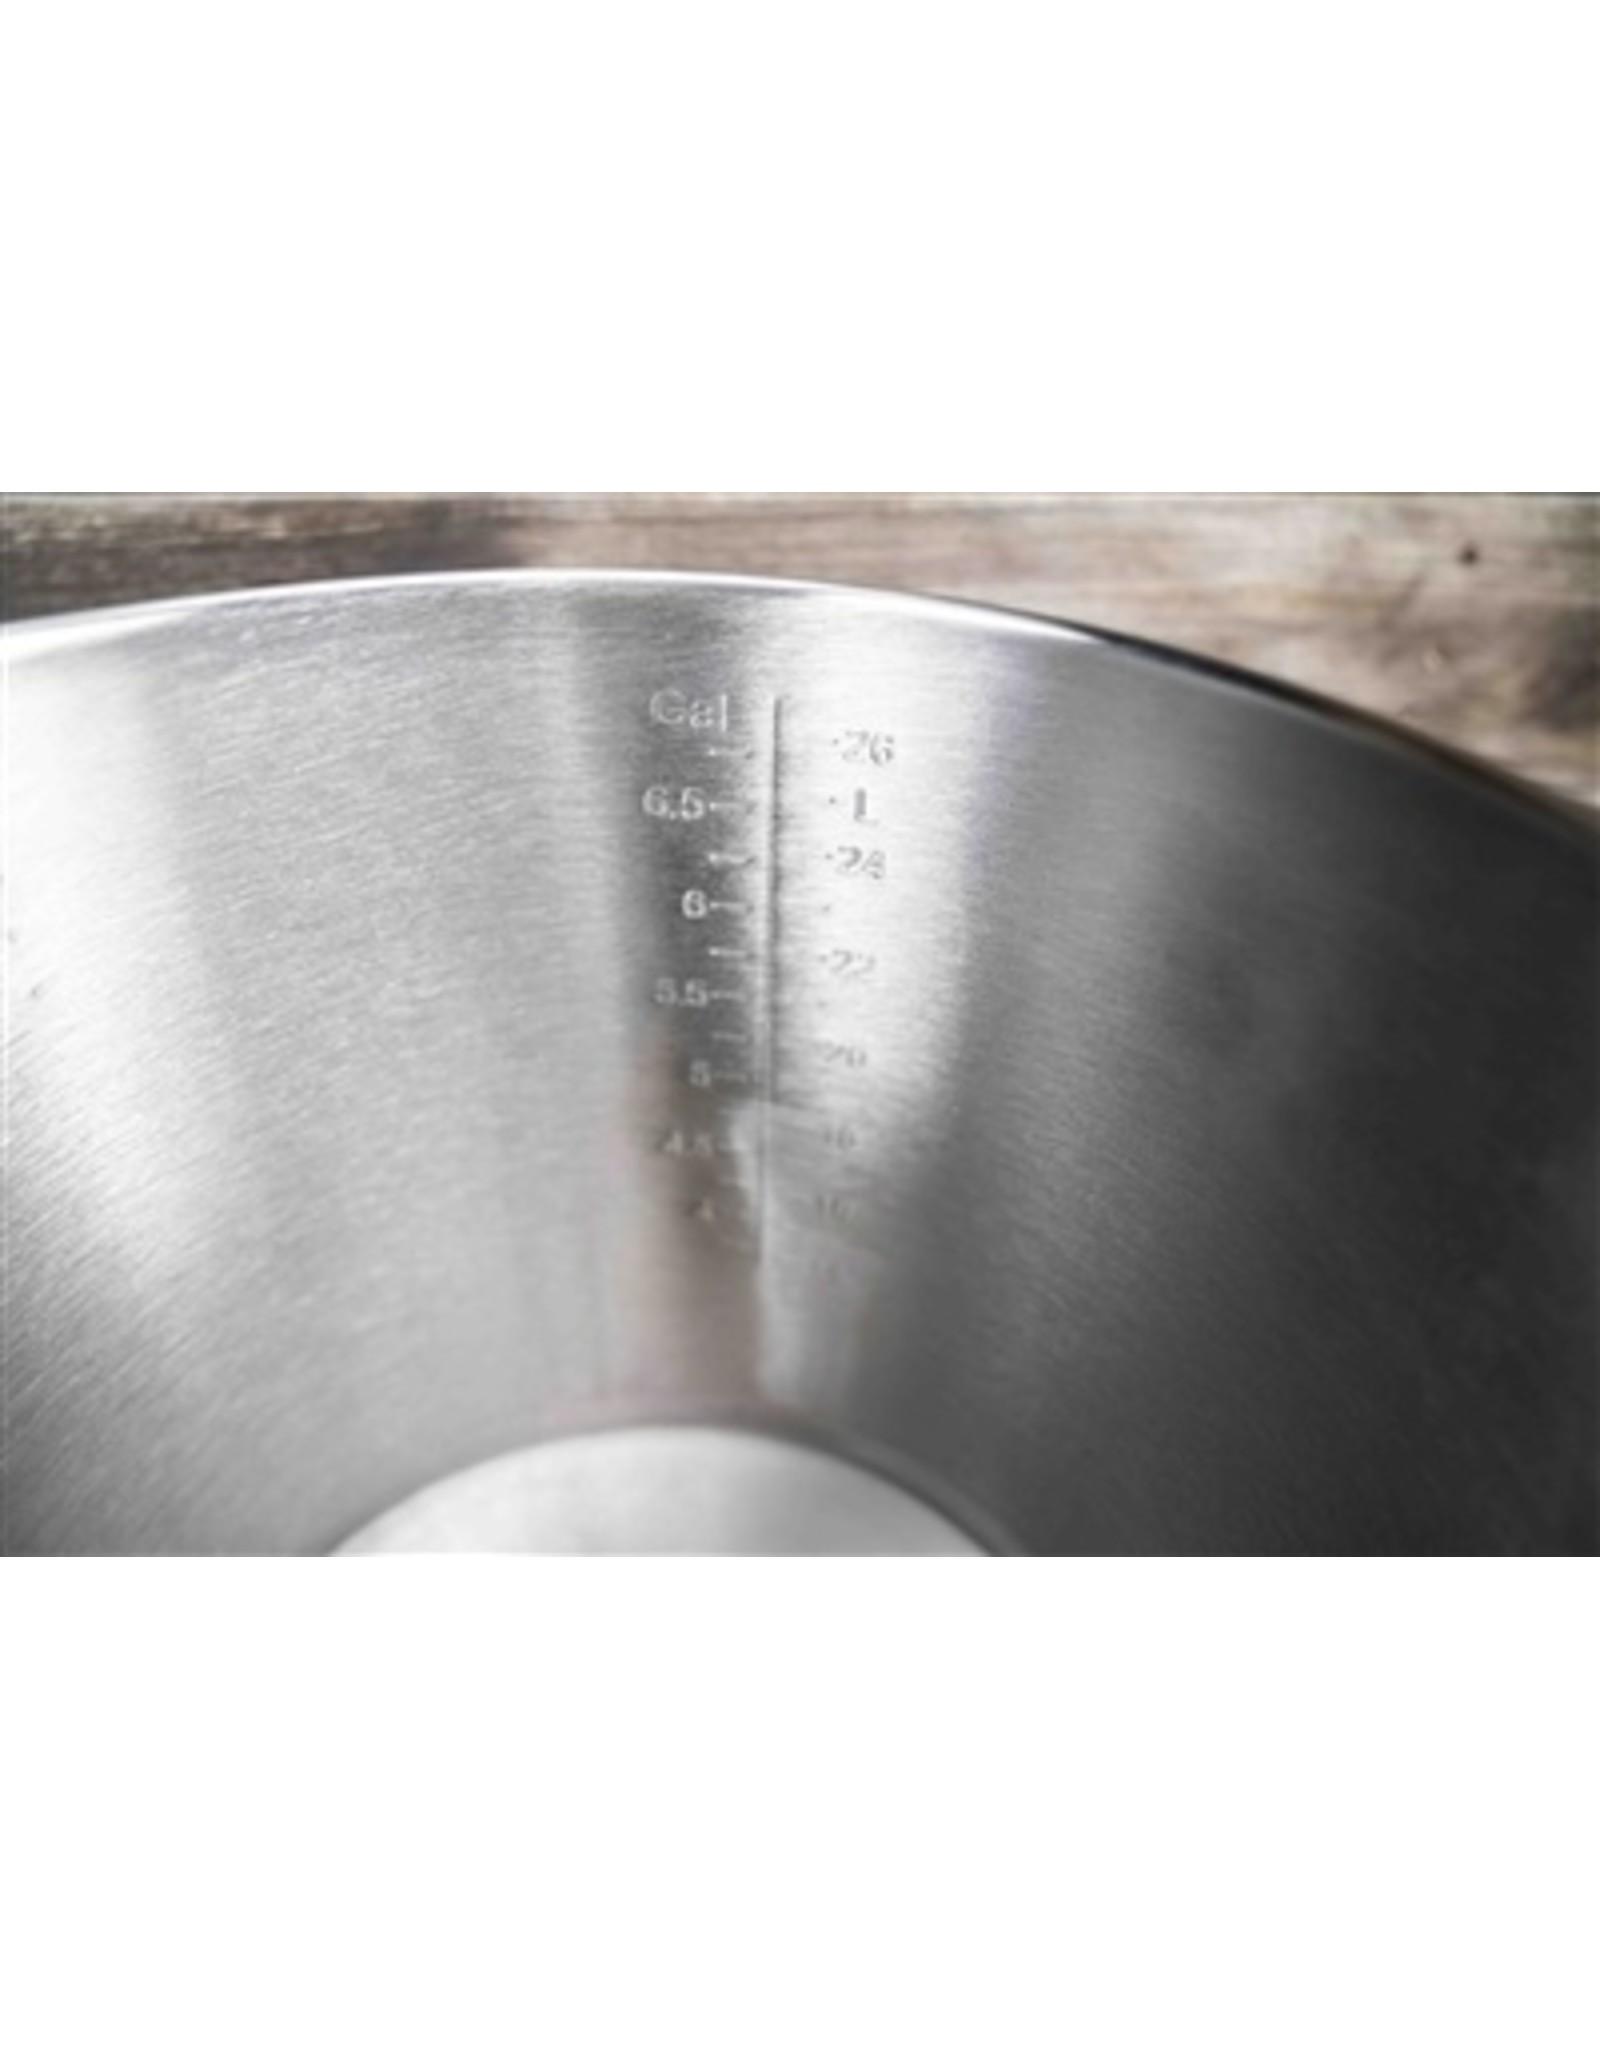 Blichmann Anvil Crucible Conical Fermentor - 7 Gallon